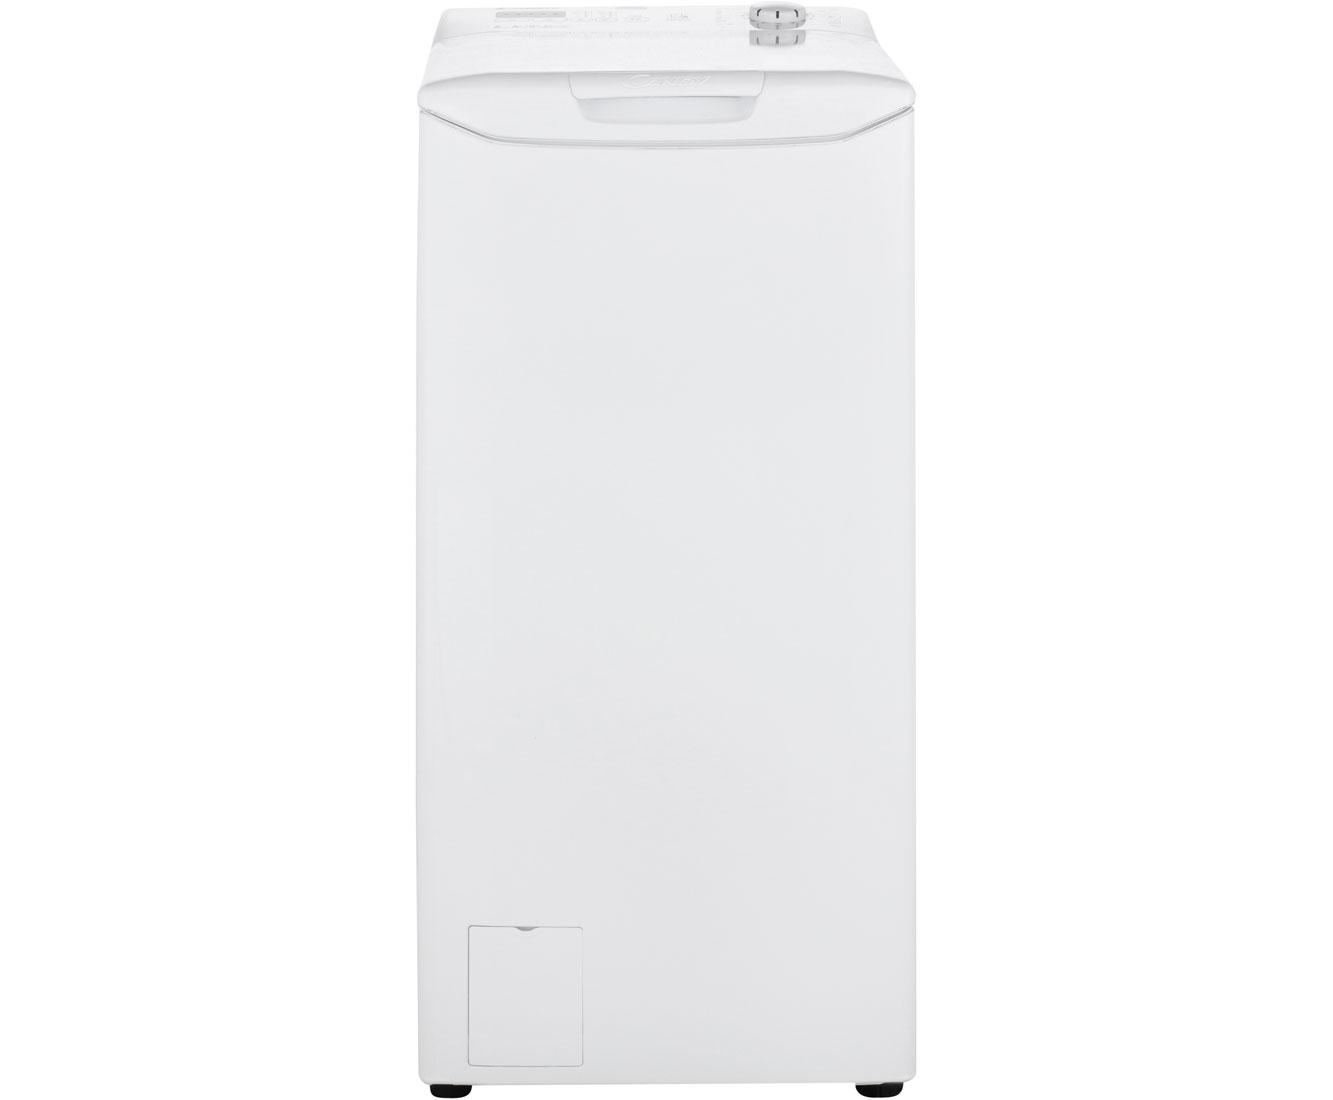 Candy Cst 362l S Waschmaschine Weiß Toplader 6 Kg 1200 Umin A